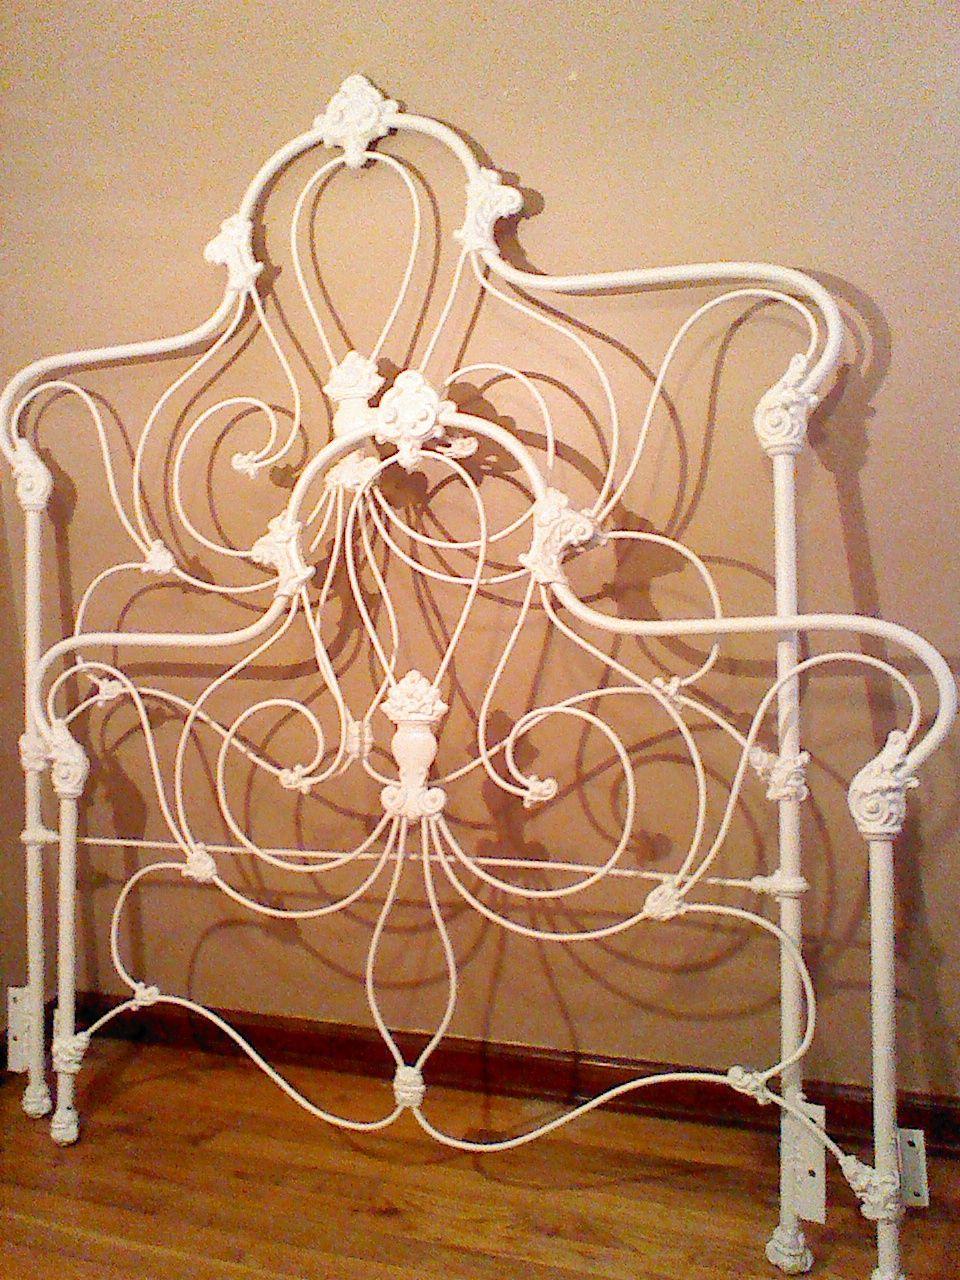 Full Size of Beautiful Wrought Iron Bed 2 Please Jugendstil Betten 180x200 Mannheim Stauraum Bett 190x90 Weiß 100x200 Modern Design Ohne Kopfteil Französische Schwarz Bett Bett Jugendstil